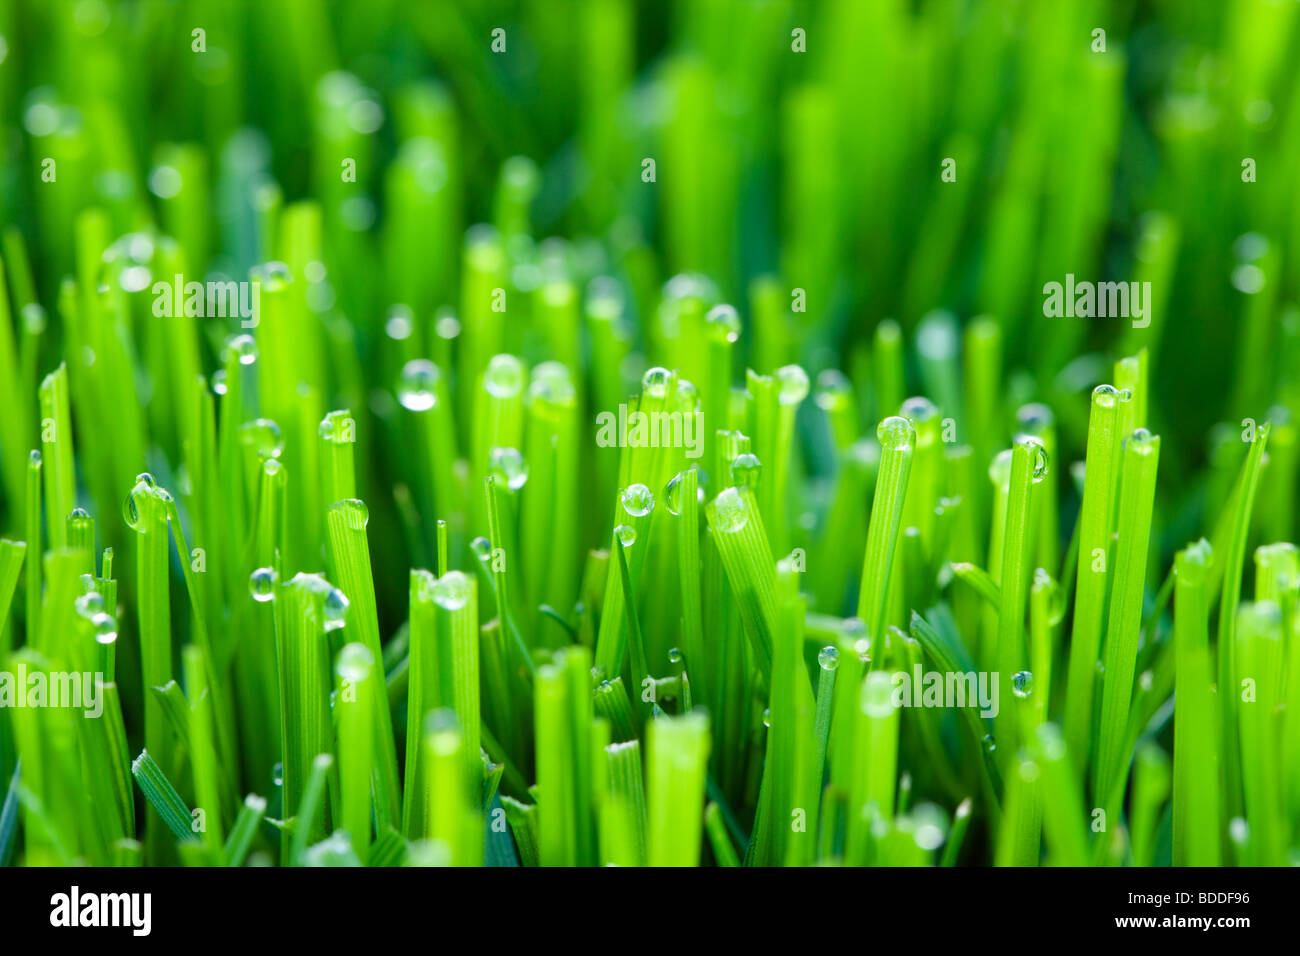 Las gotas de agua sobre el césped Imagen De Stock